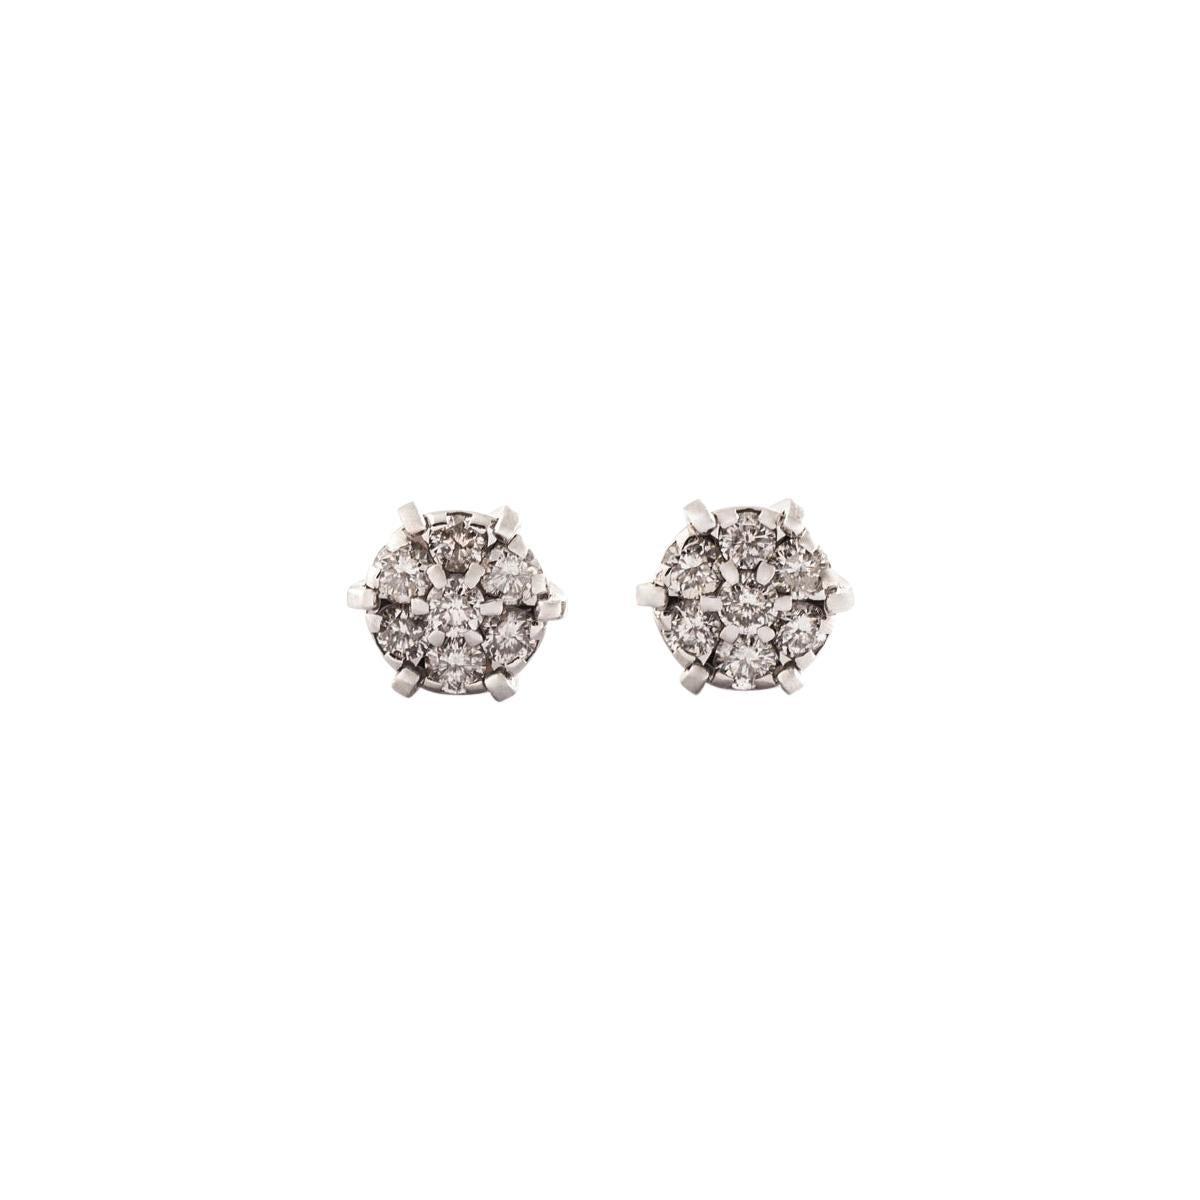 Ear Studs Earrings Diamond White Gold